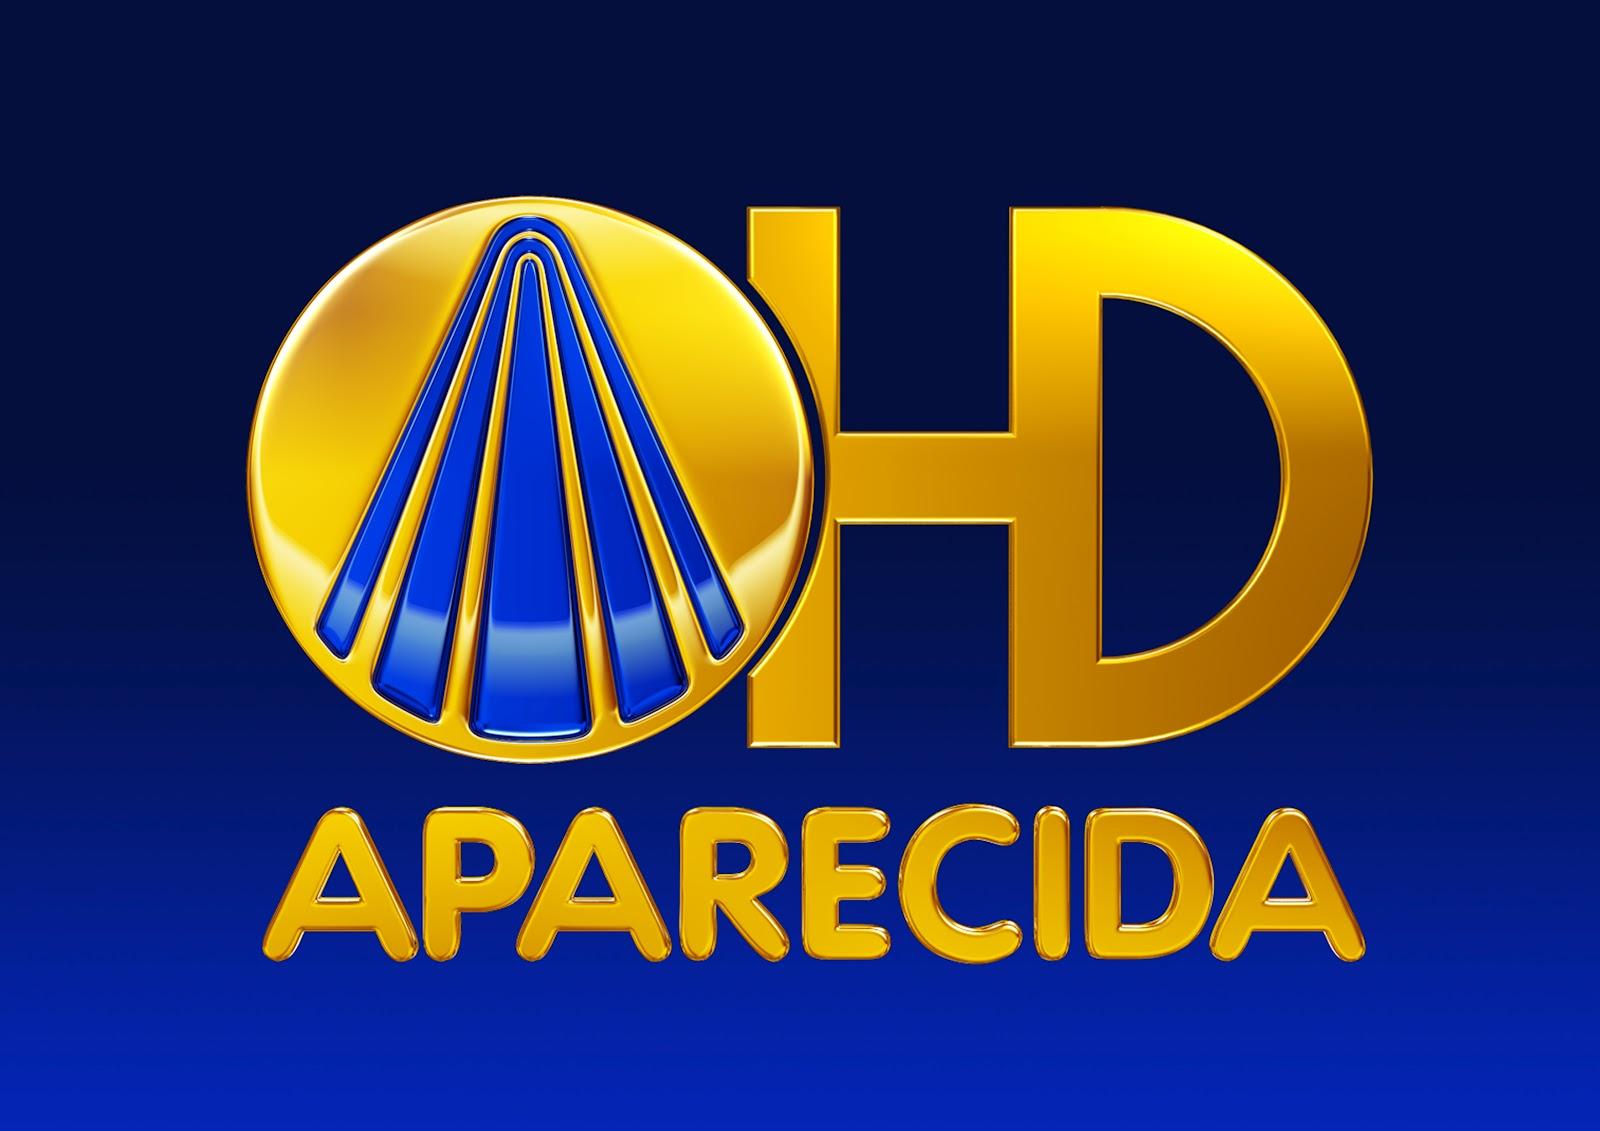 Hd Sat 201 Lite Tv Digital Ara 199 Atuba Sp